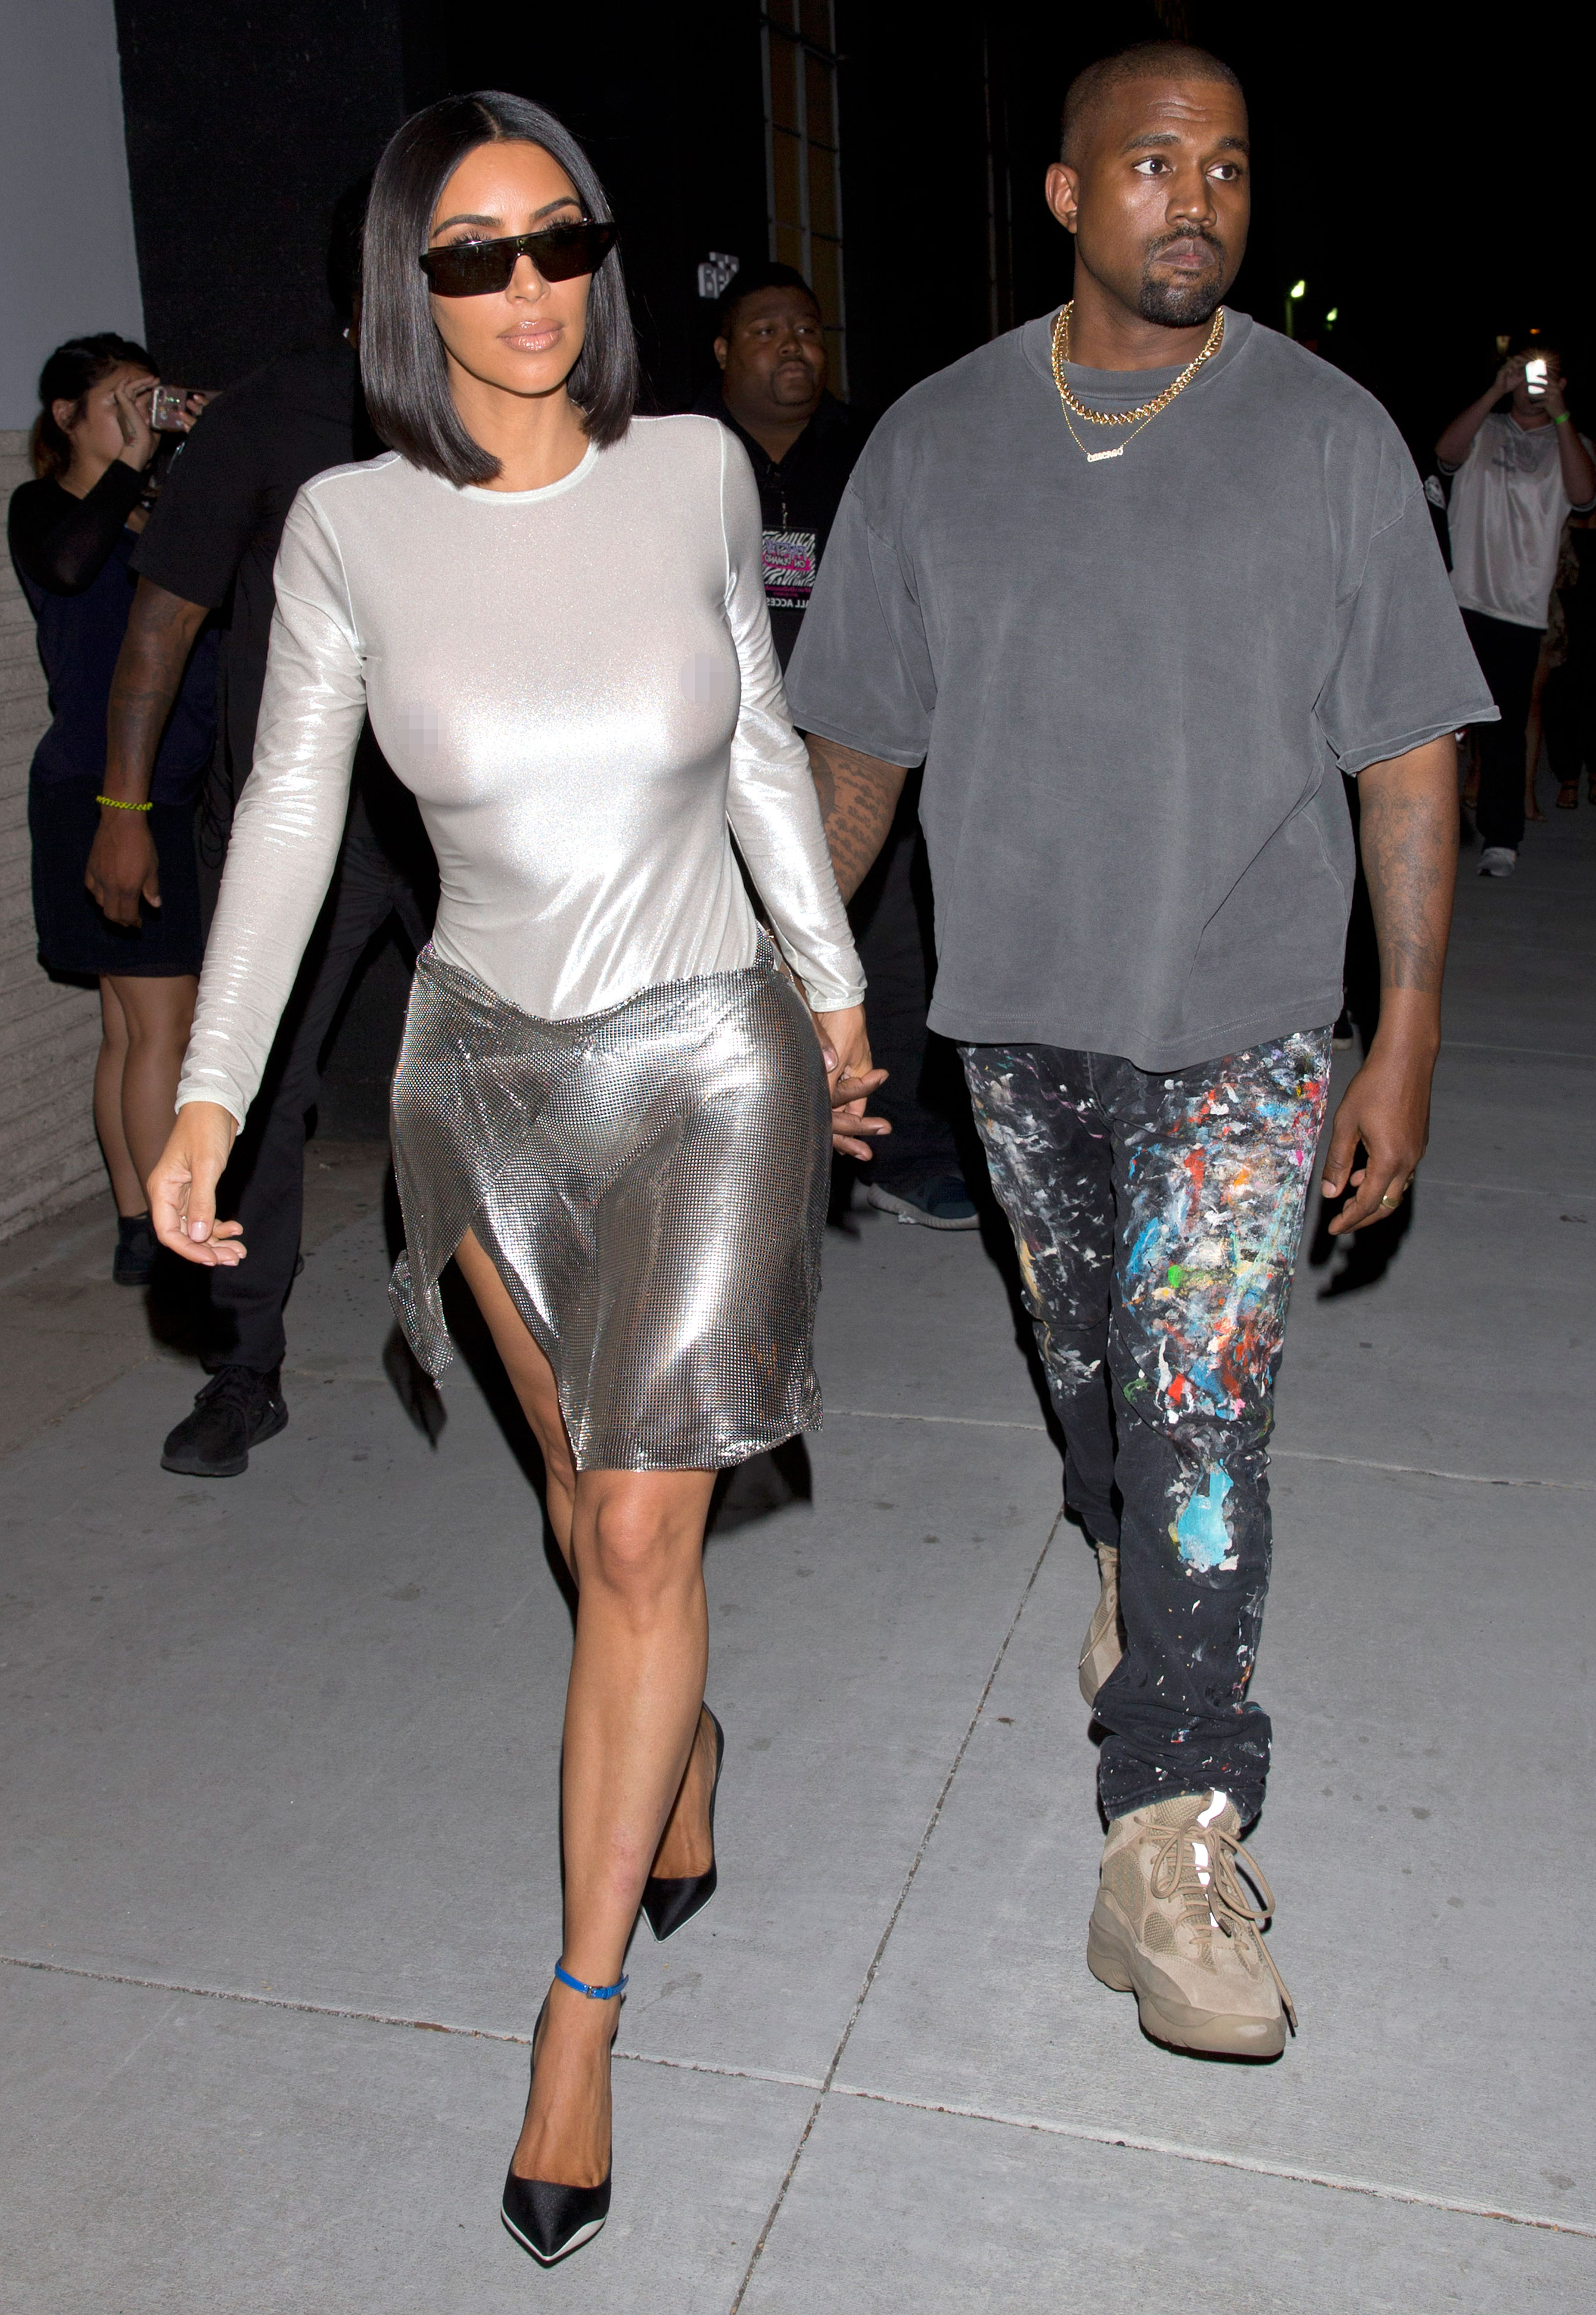 Kim Kardashian Says She Misses Her Long Hair | People For Kim Kardashian Short Hairstyles (View 21 of 25)